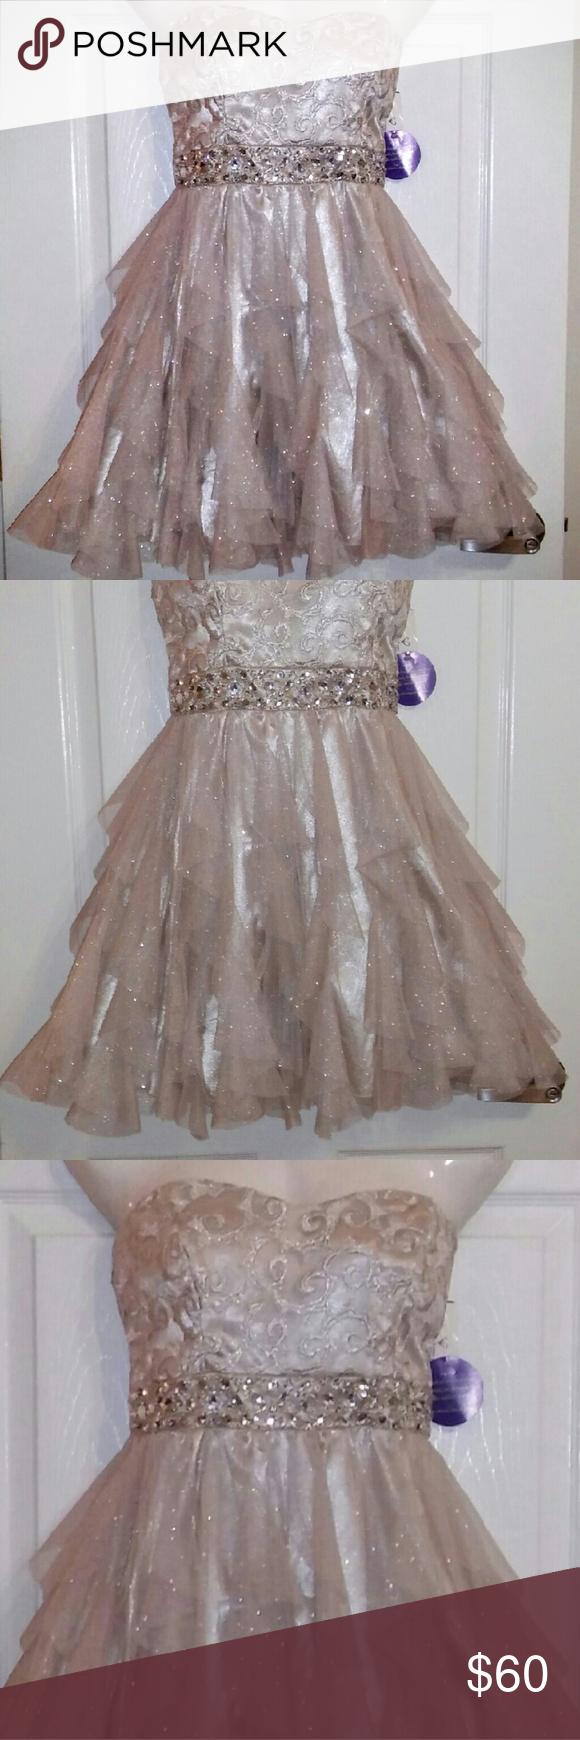 B darlin strapless party dress nwt pinterest strapless prom